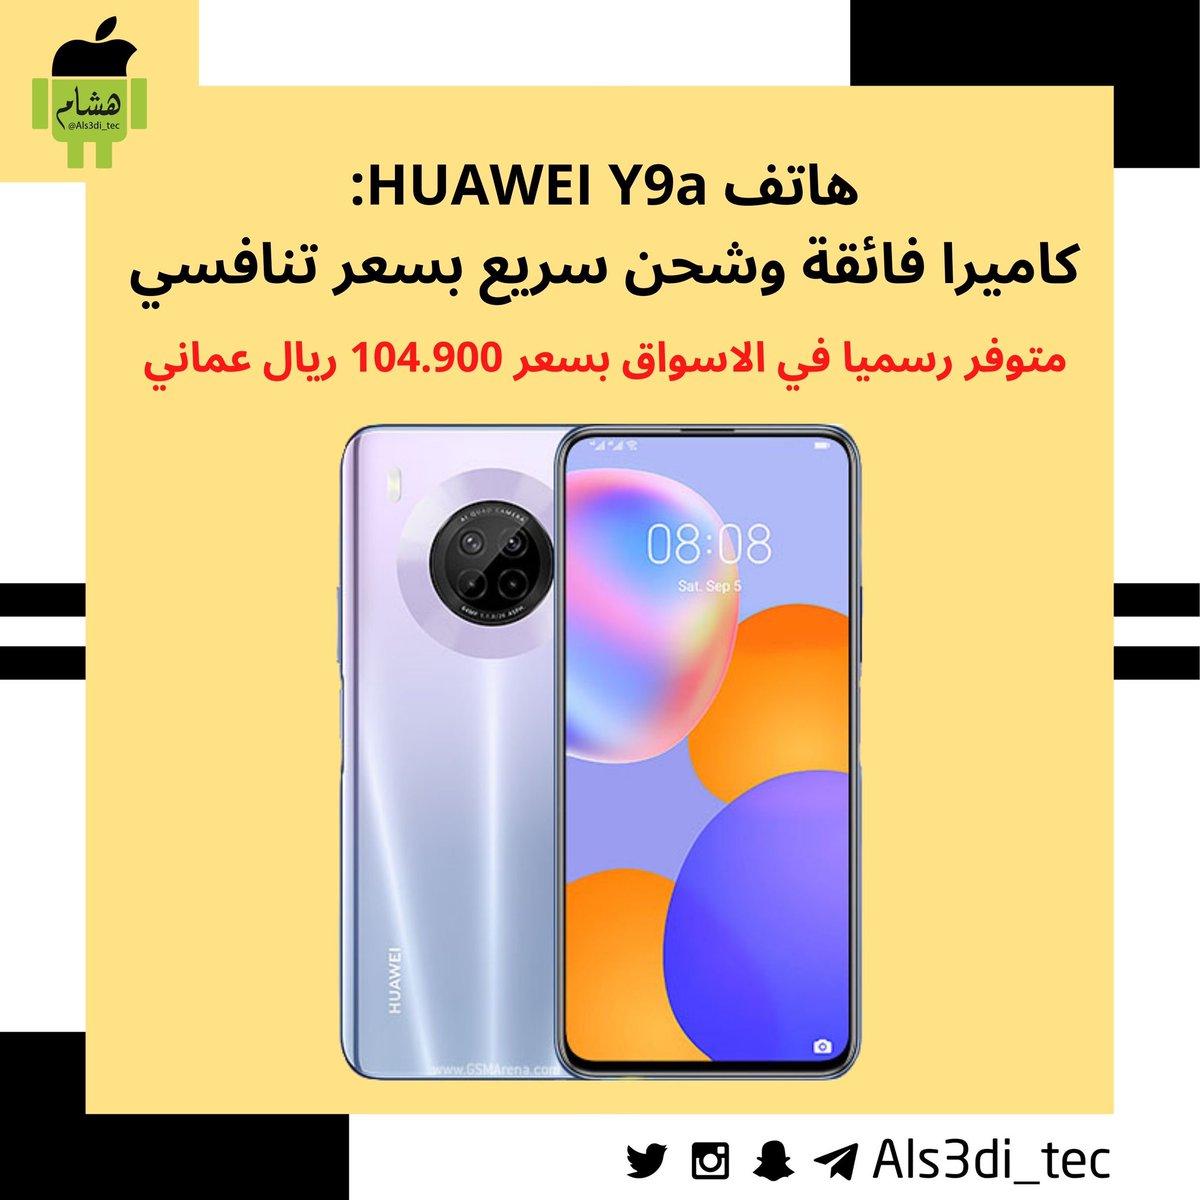 هاتف : #هواوي #y9a كاميرا فائقة و شحن سريع بسعر تنافسي   هاتف #huaweiy9a متوفر رسميا في الاسواق بسعر 104.900 ريال عماني   @HuaweiArabia https://t.co/FT9UE0fut7